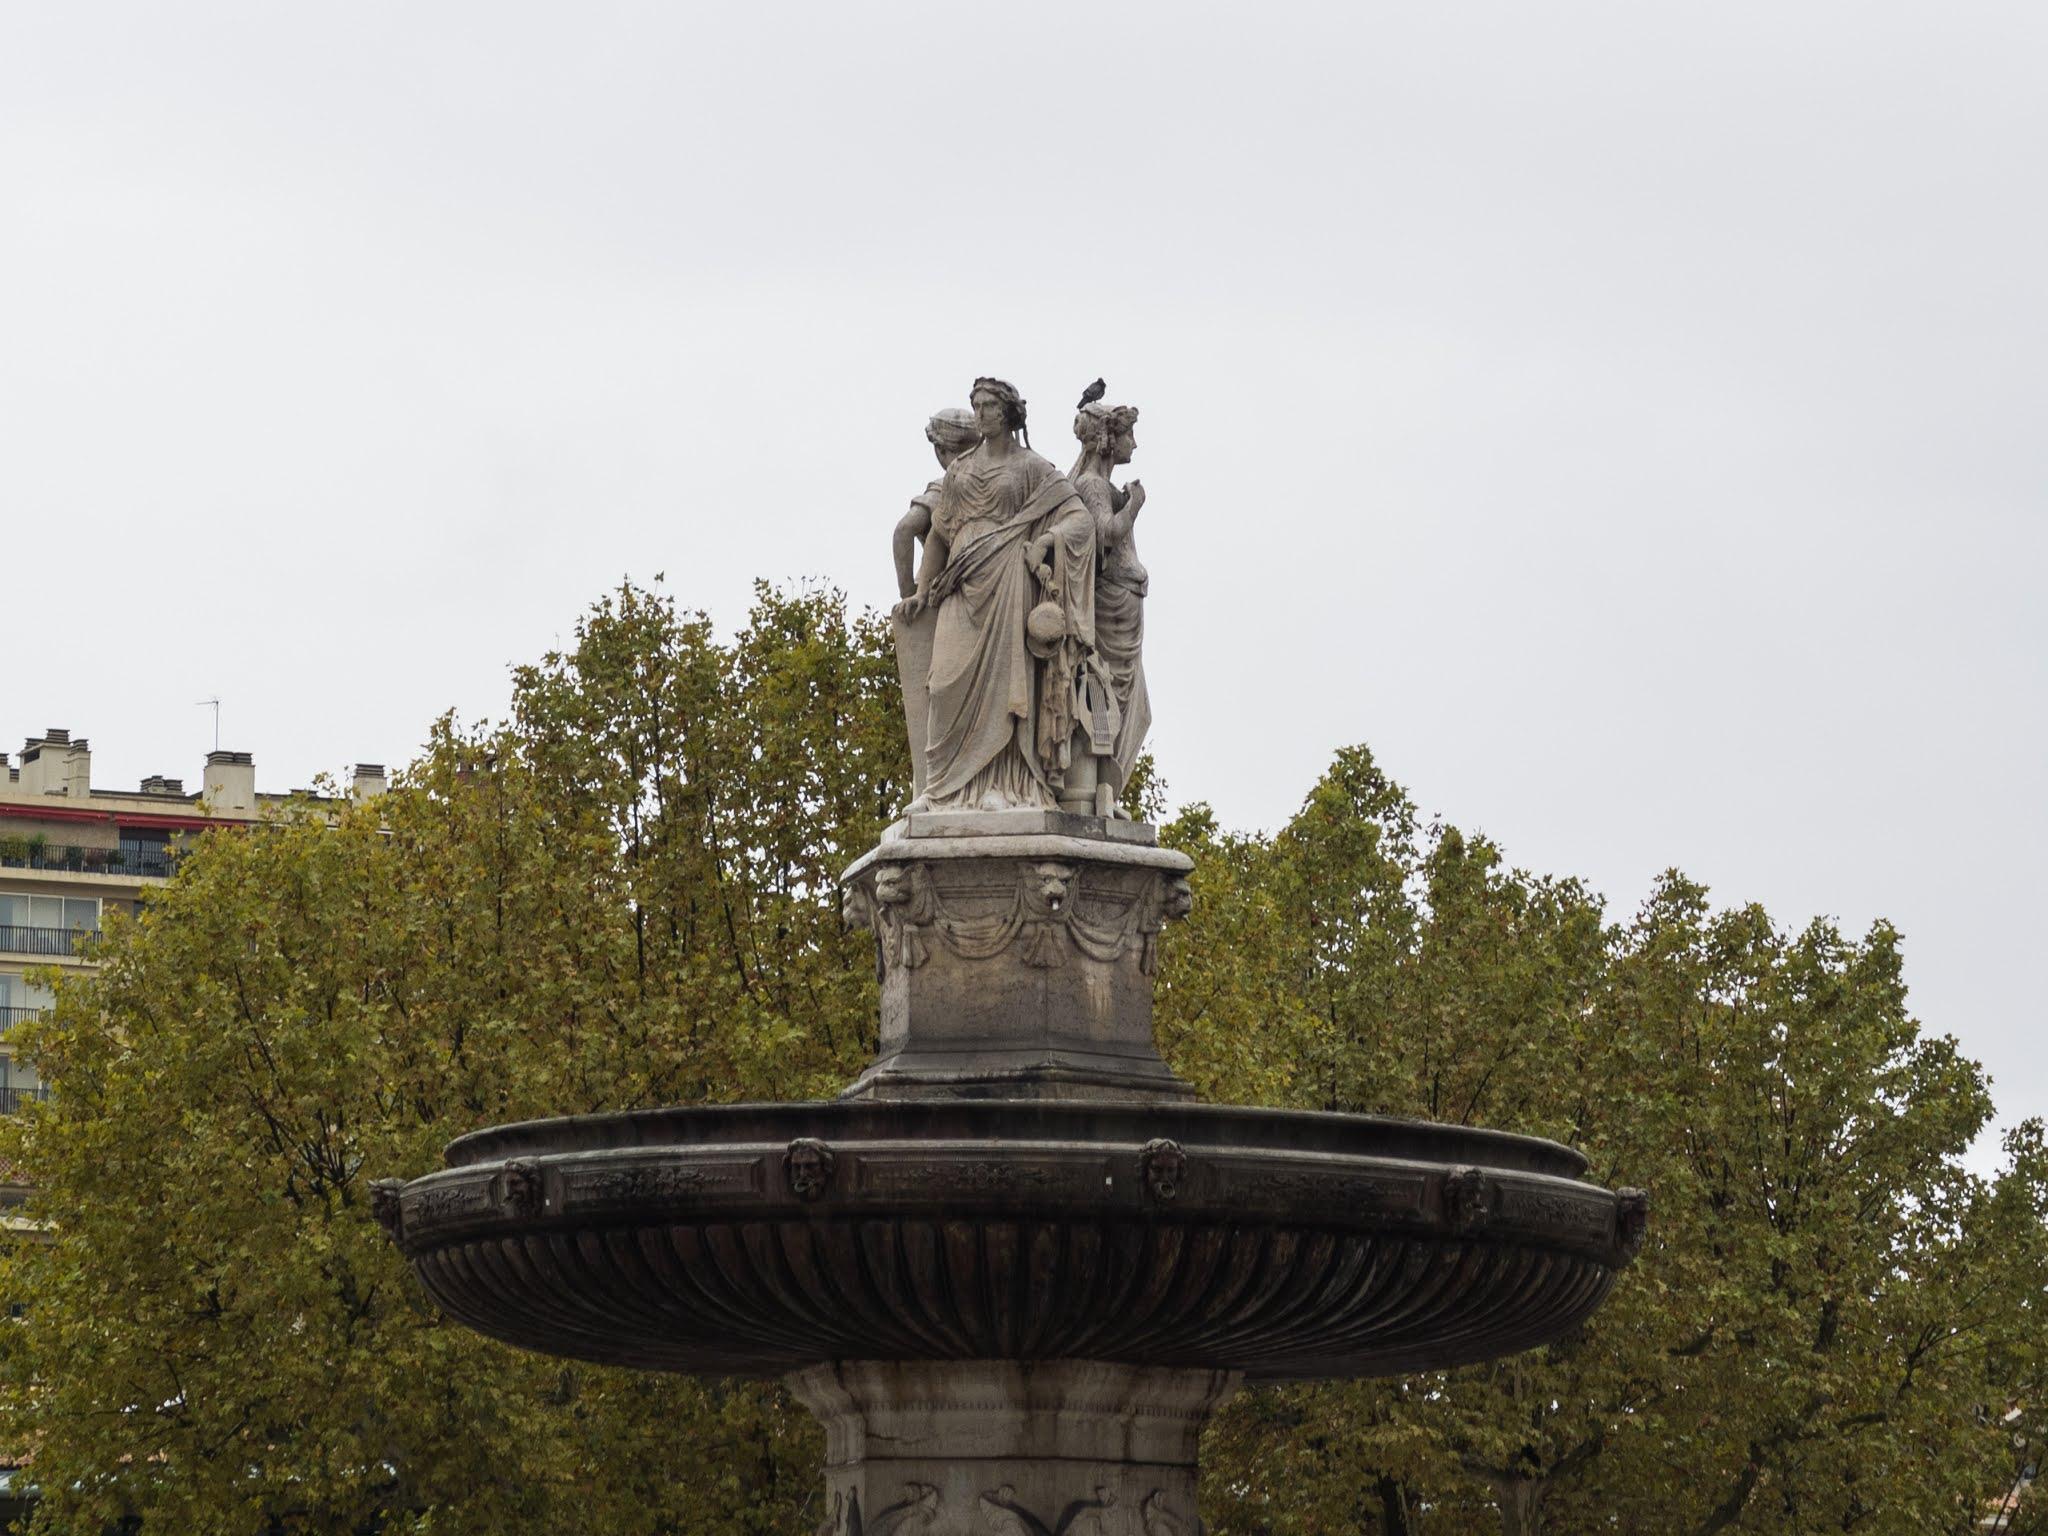 Fontaine de la Rotonde at the bottom of Cours Mirabeau in Aix-en-Provence.